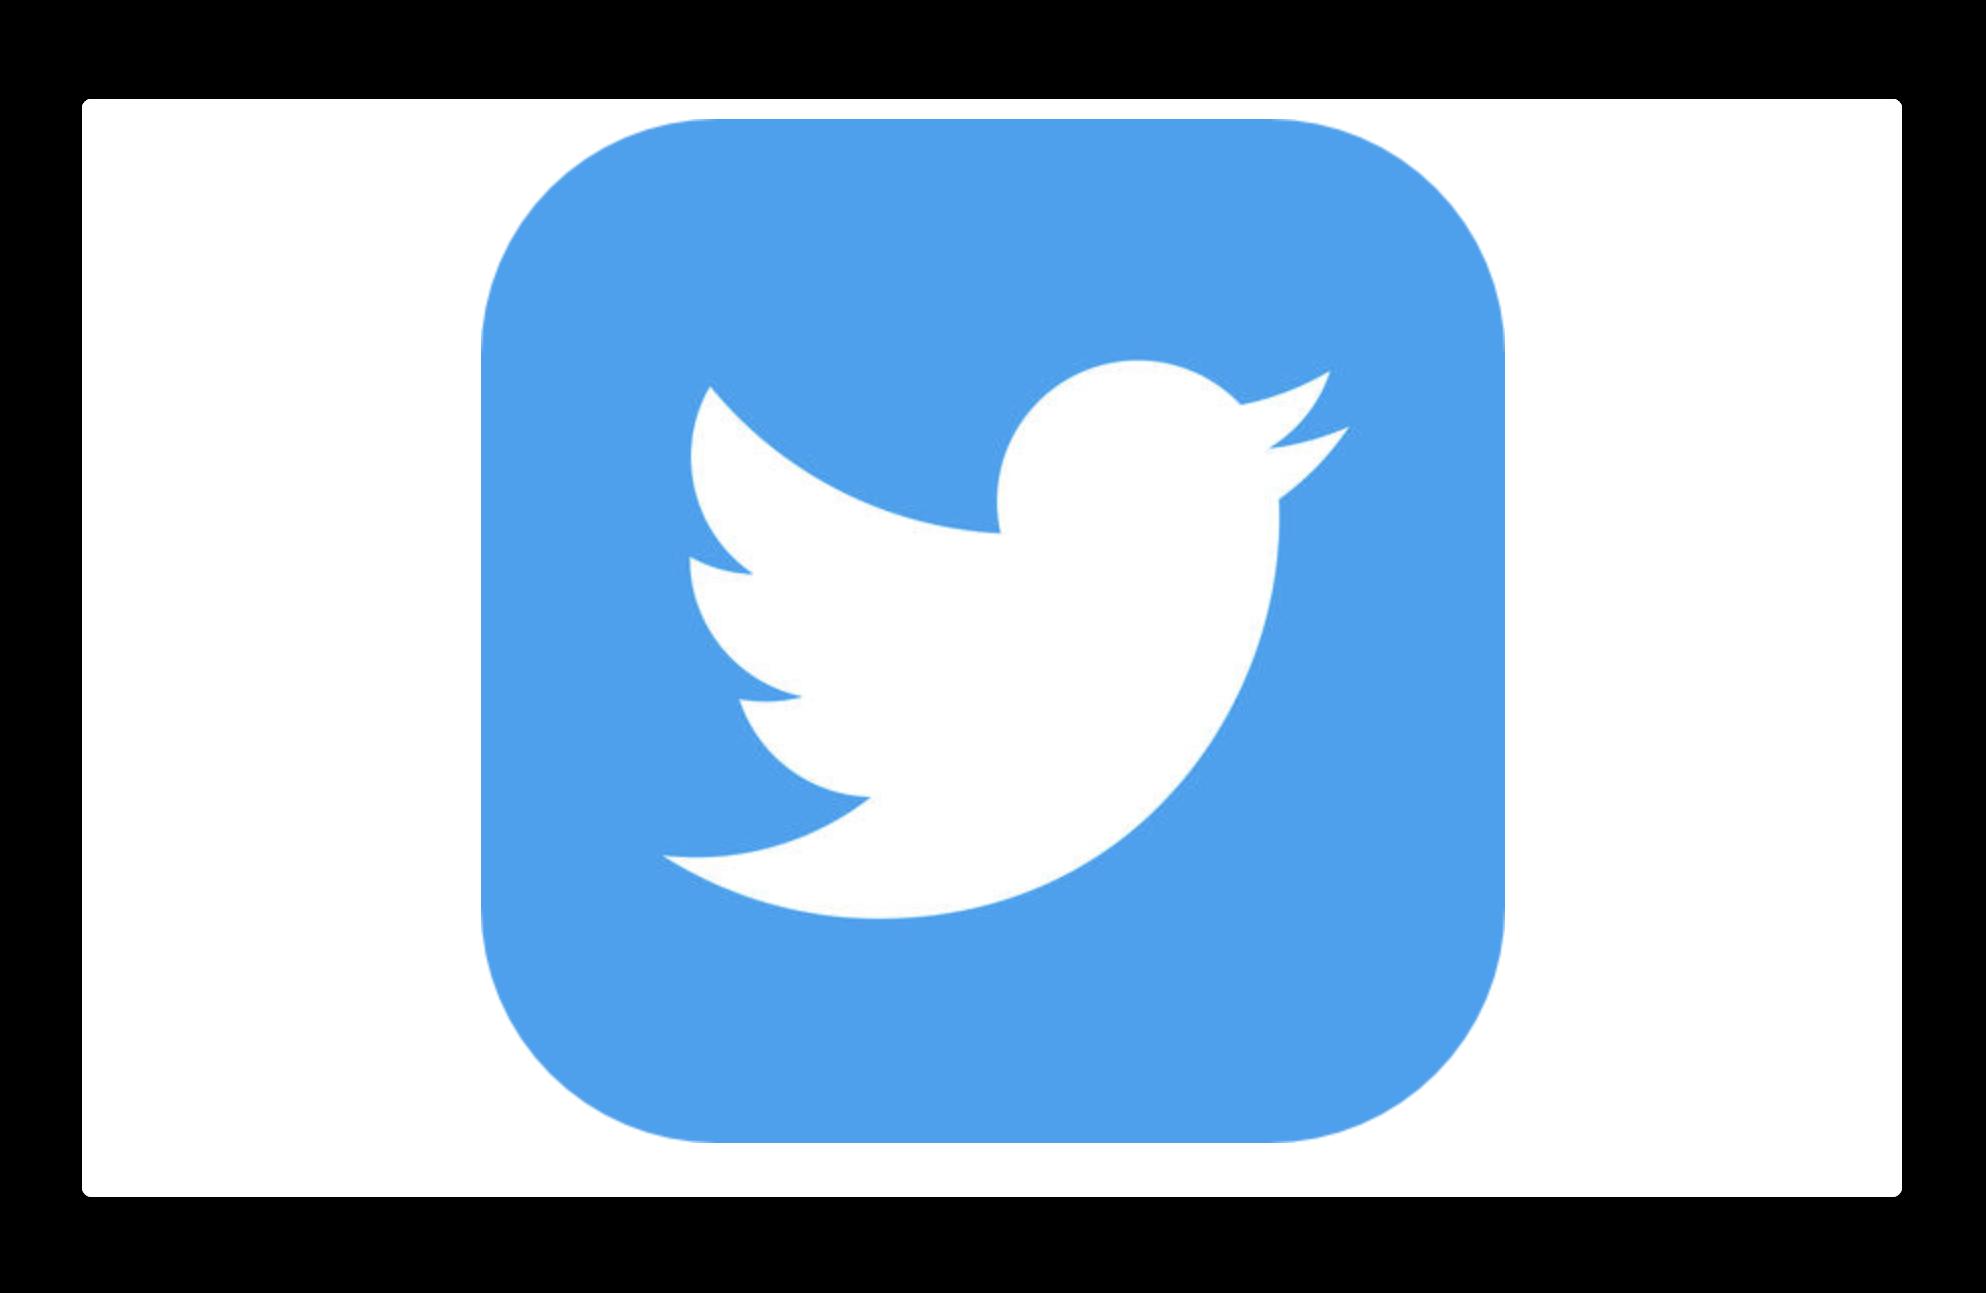 Twitter、パスワードをプレーンテキストで格納するバグで、パスワードの変更するよう推奨